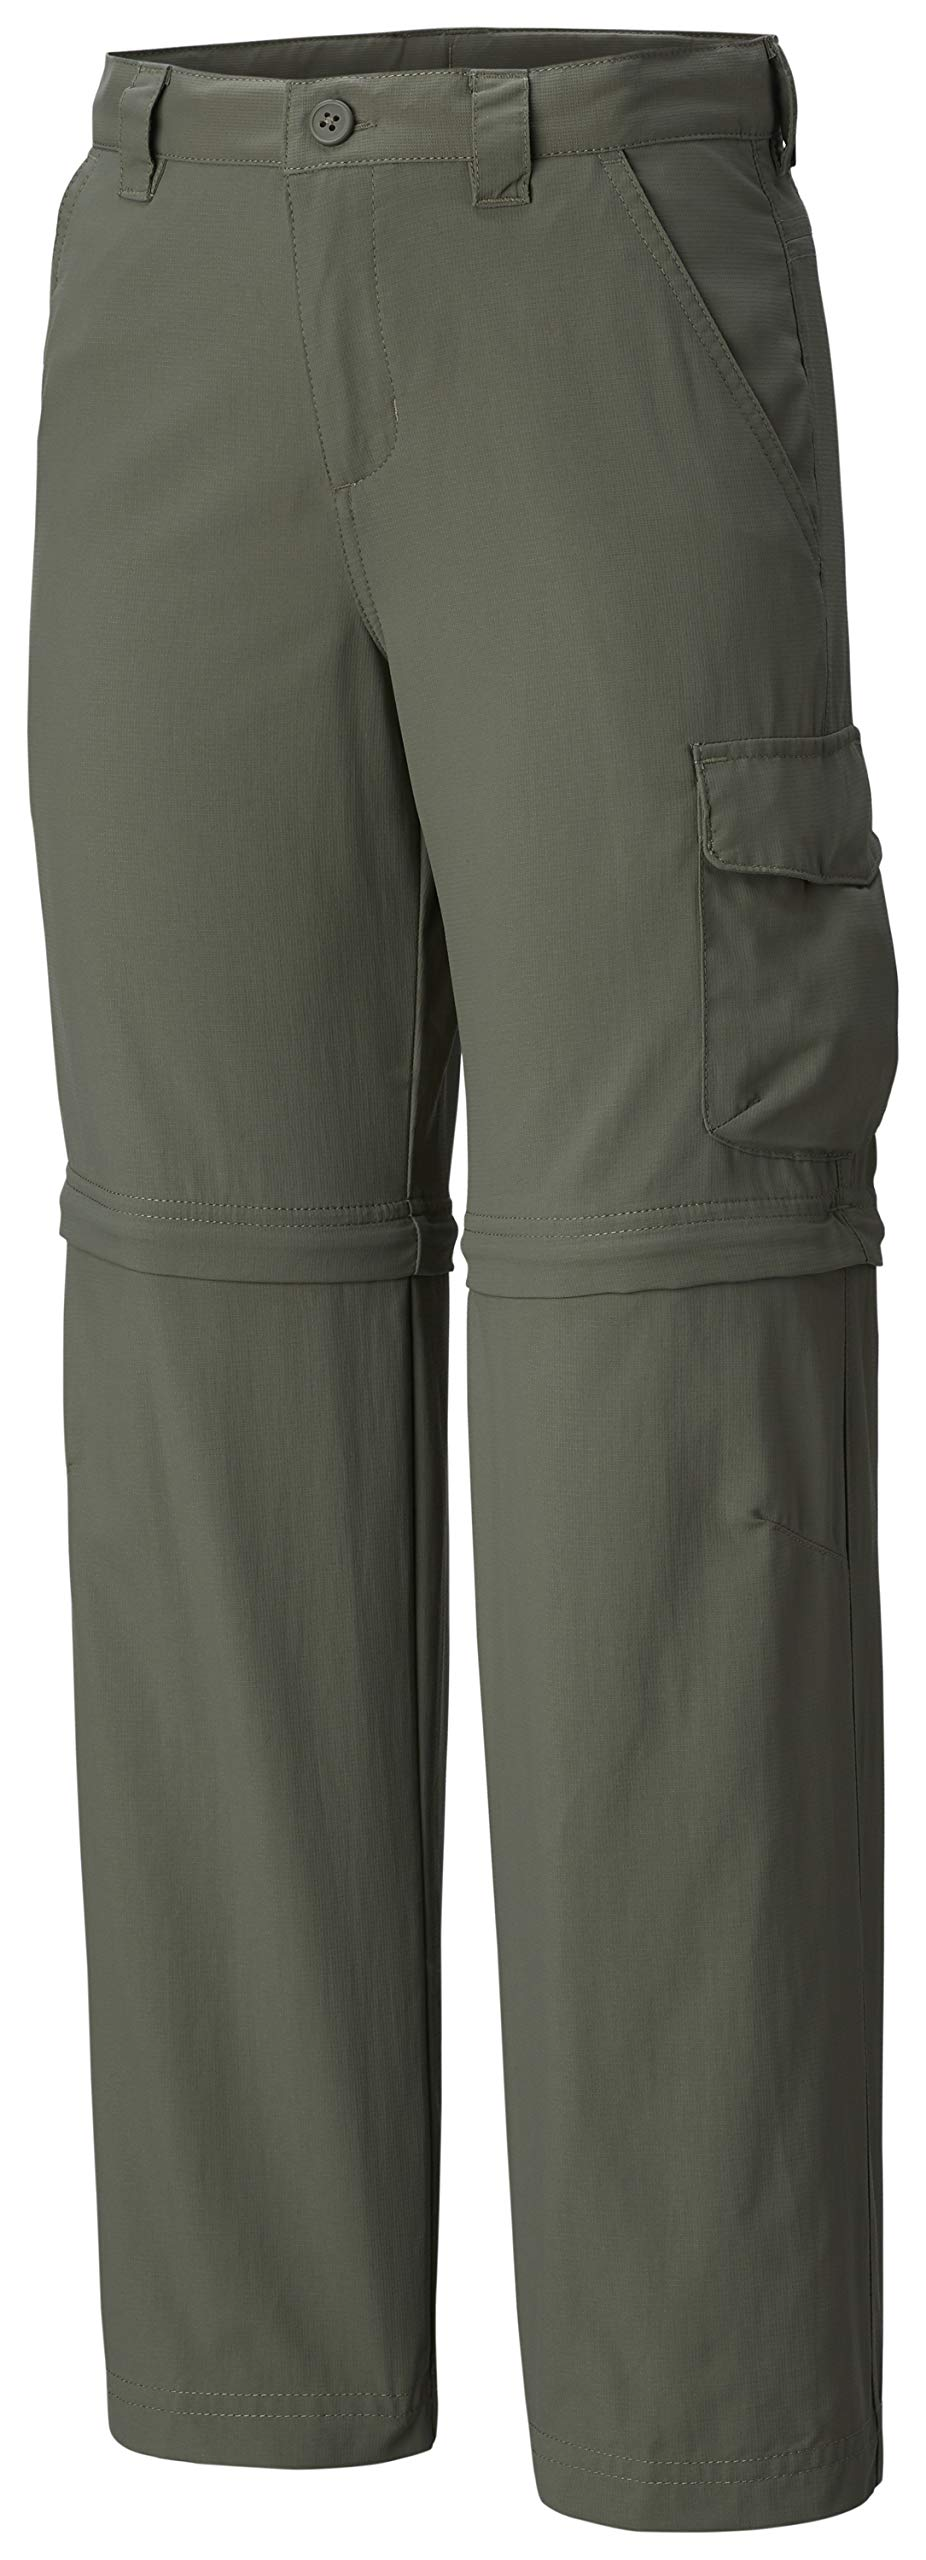 Columbia Youth Boys Silver Ridge III Convertible Pants, Cypress, Small by Columbia